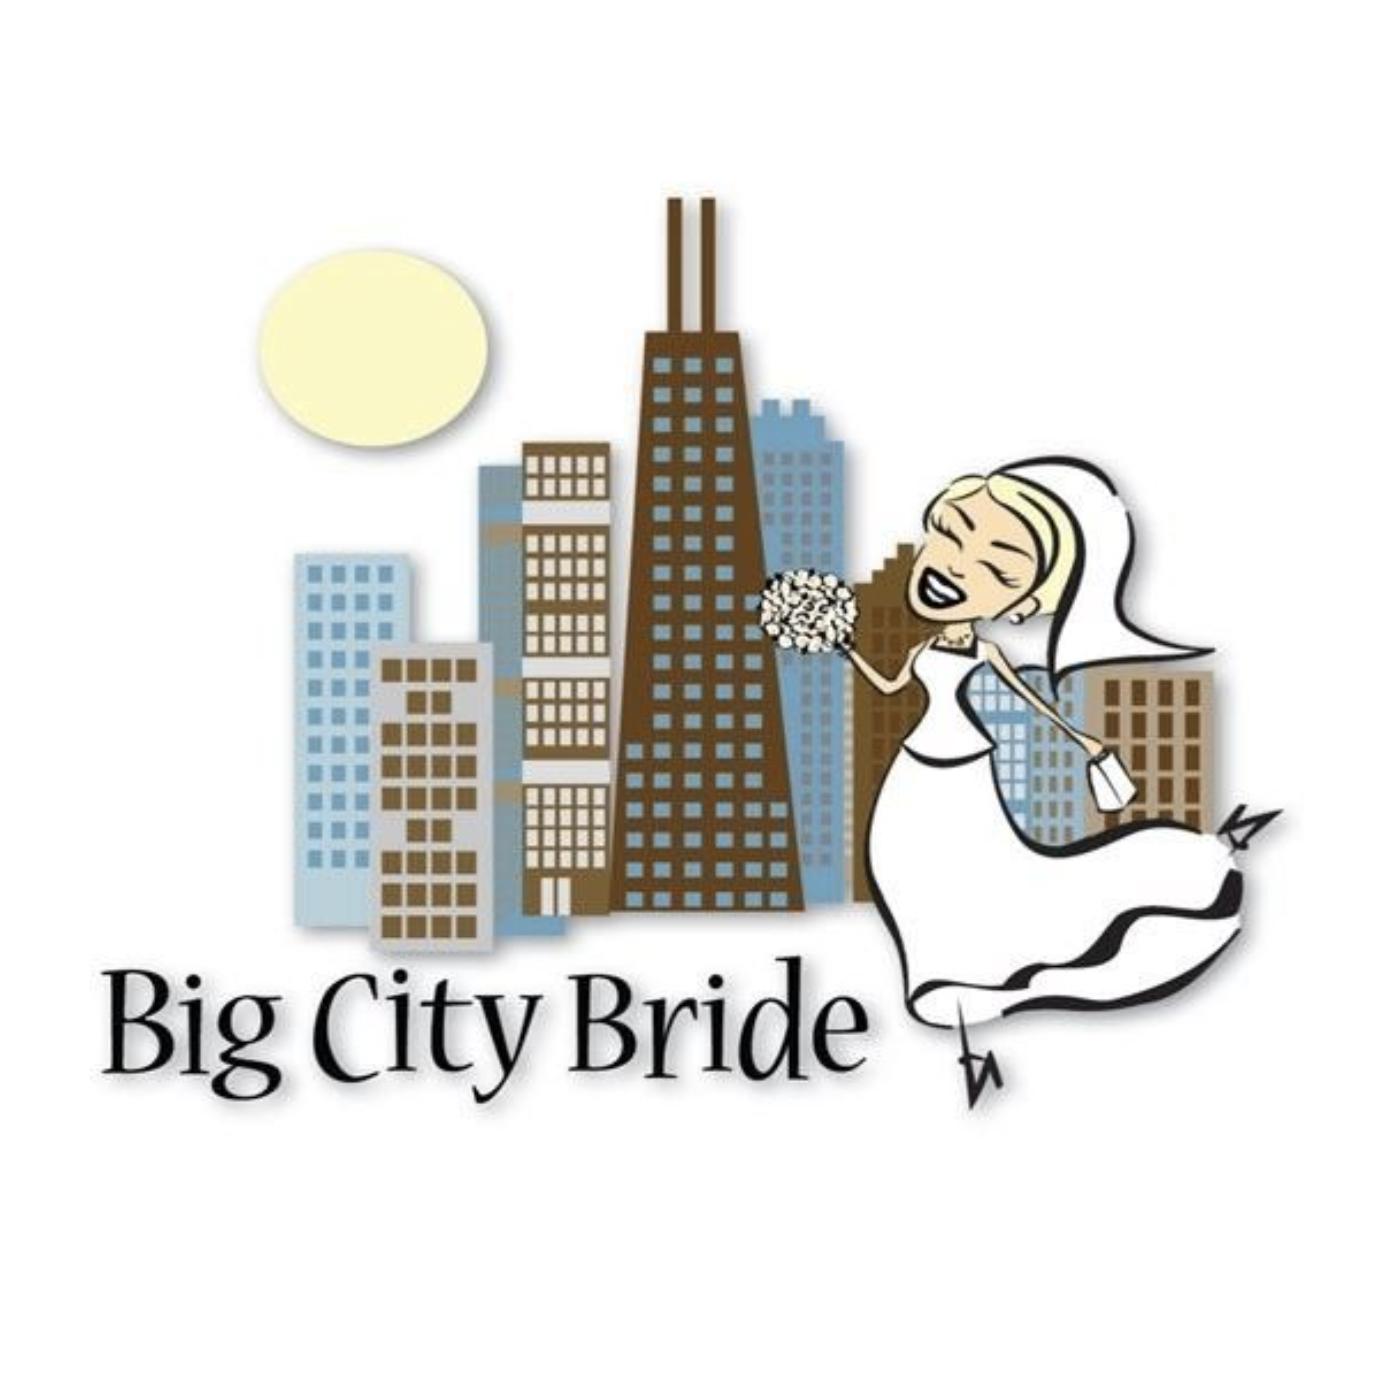 Bigcitybridelogo